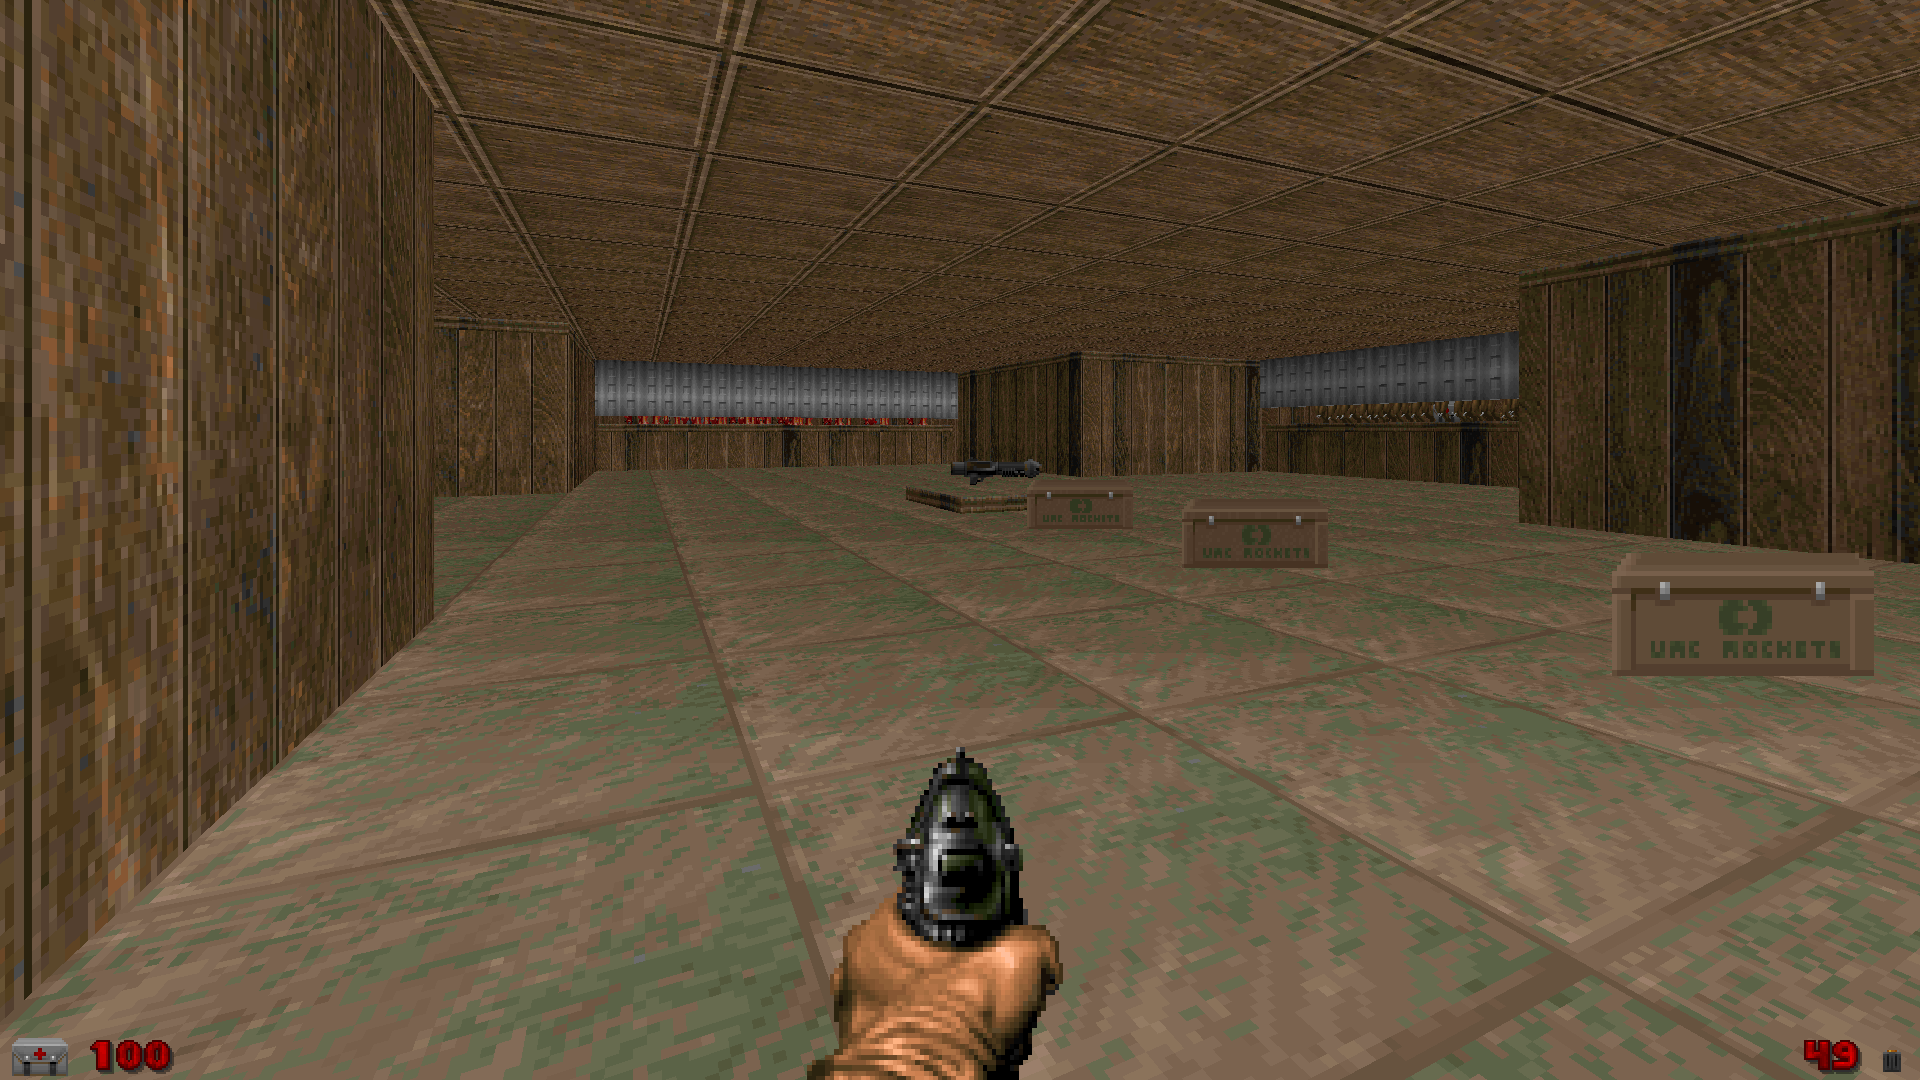 Screenshot_Doom_20190506_225539.png.719e3df26b34556f2c51f2dc3df2f6f2.png